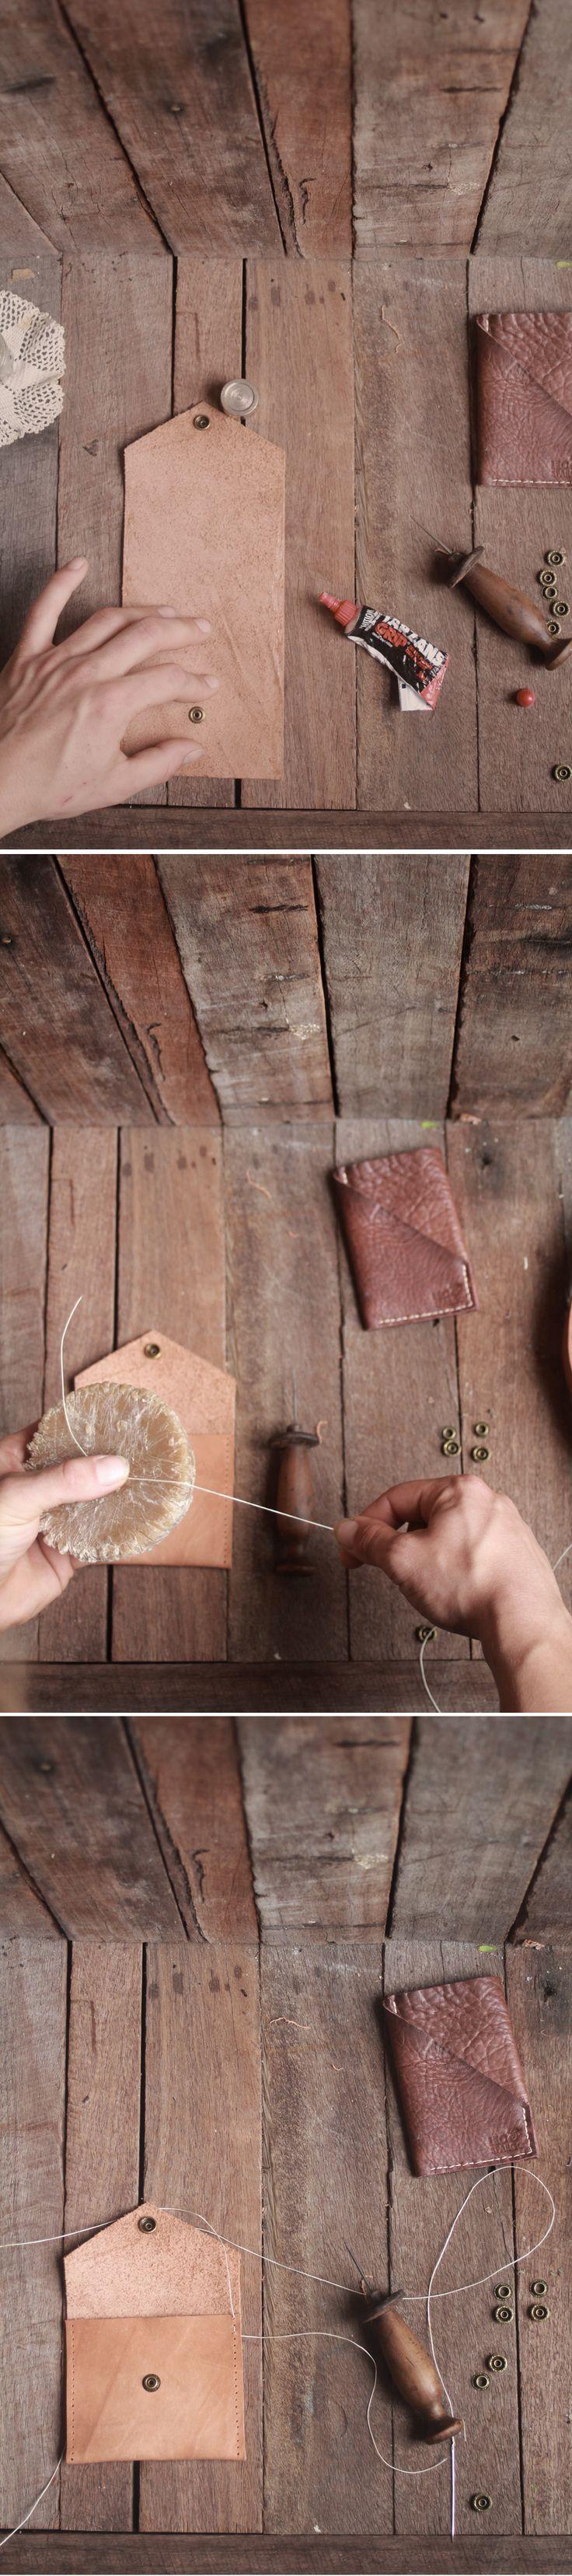 Handmade leather pouch wallet. #leatherwork  $29.95 leoandspargo.etsy.com